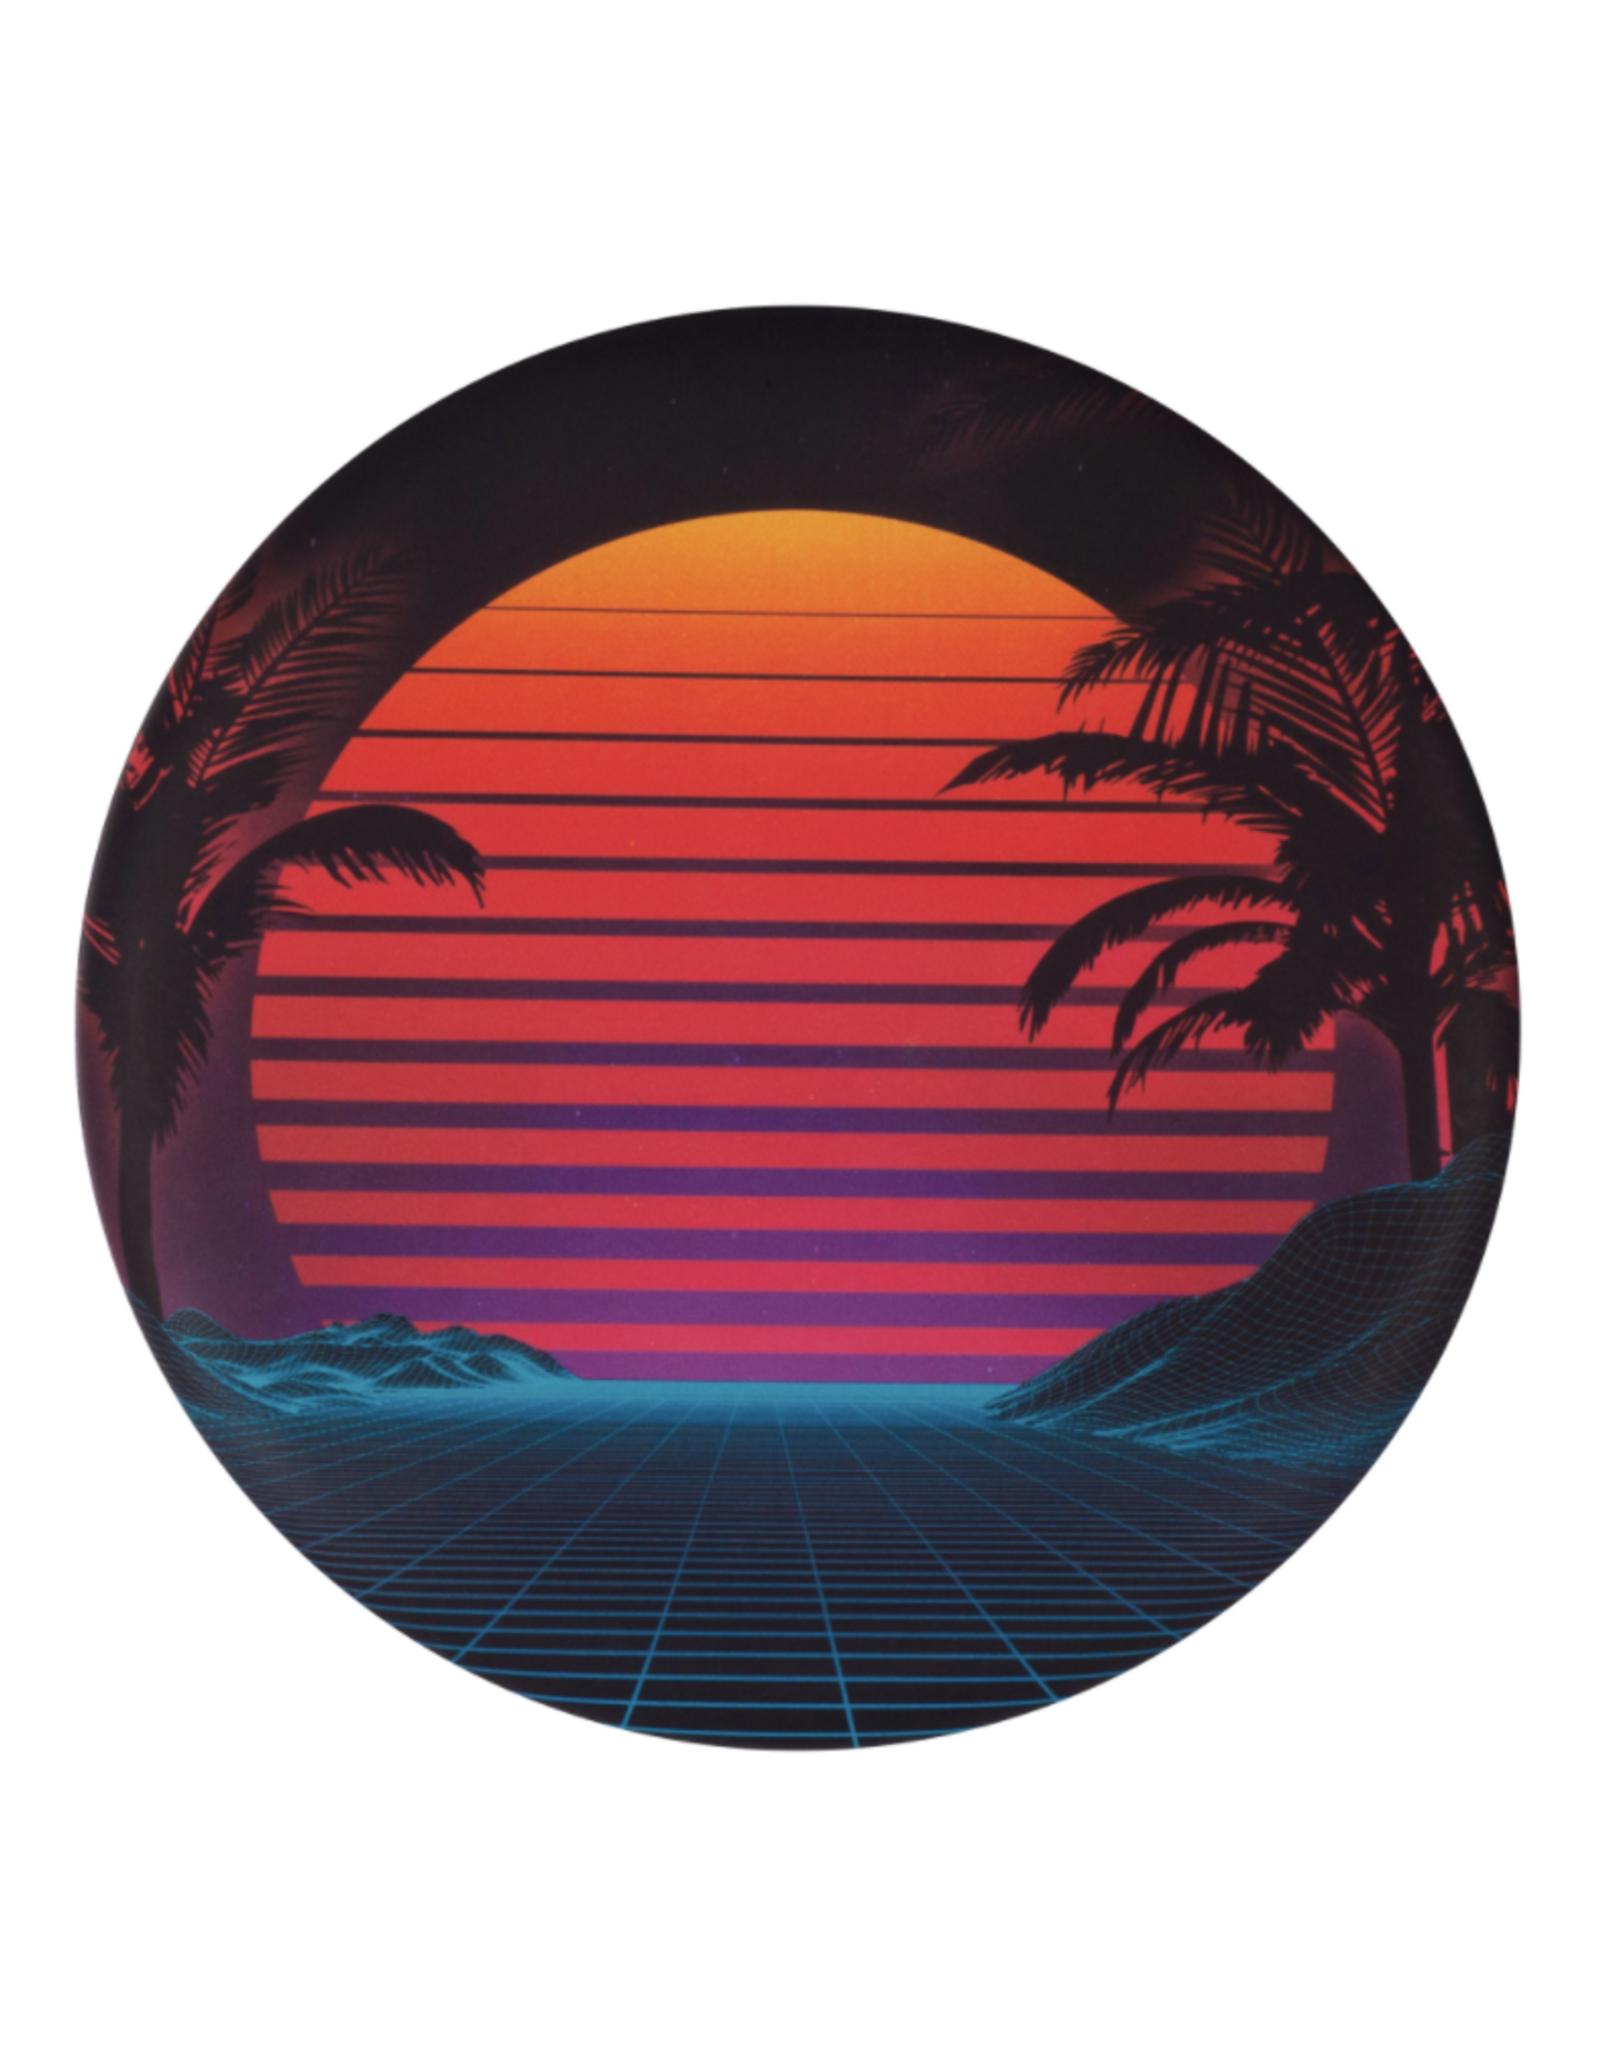 Waboba Waboba Wingman - Sunset